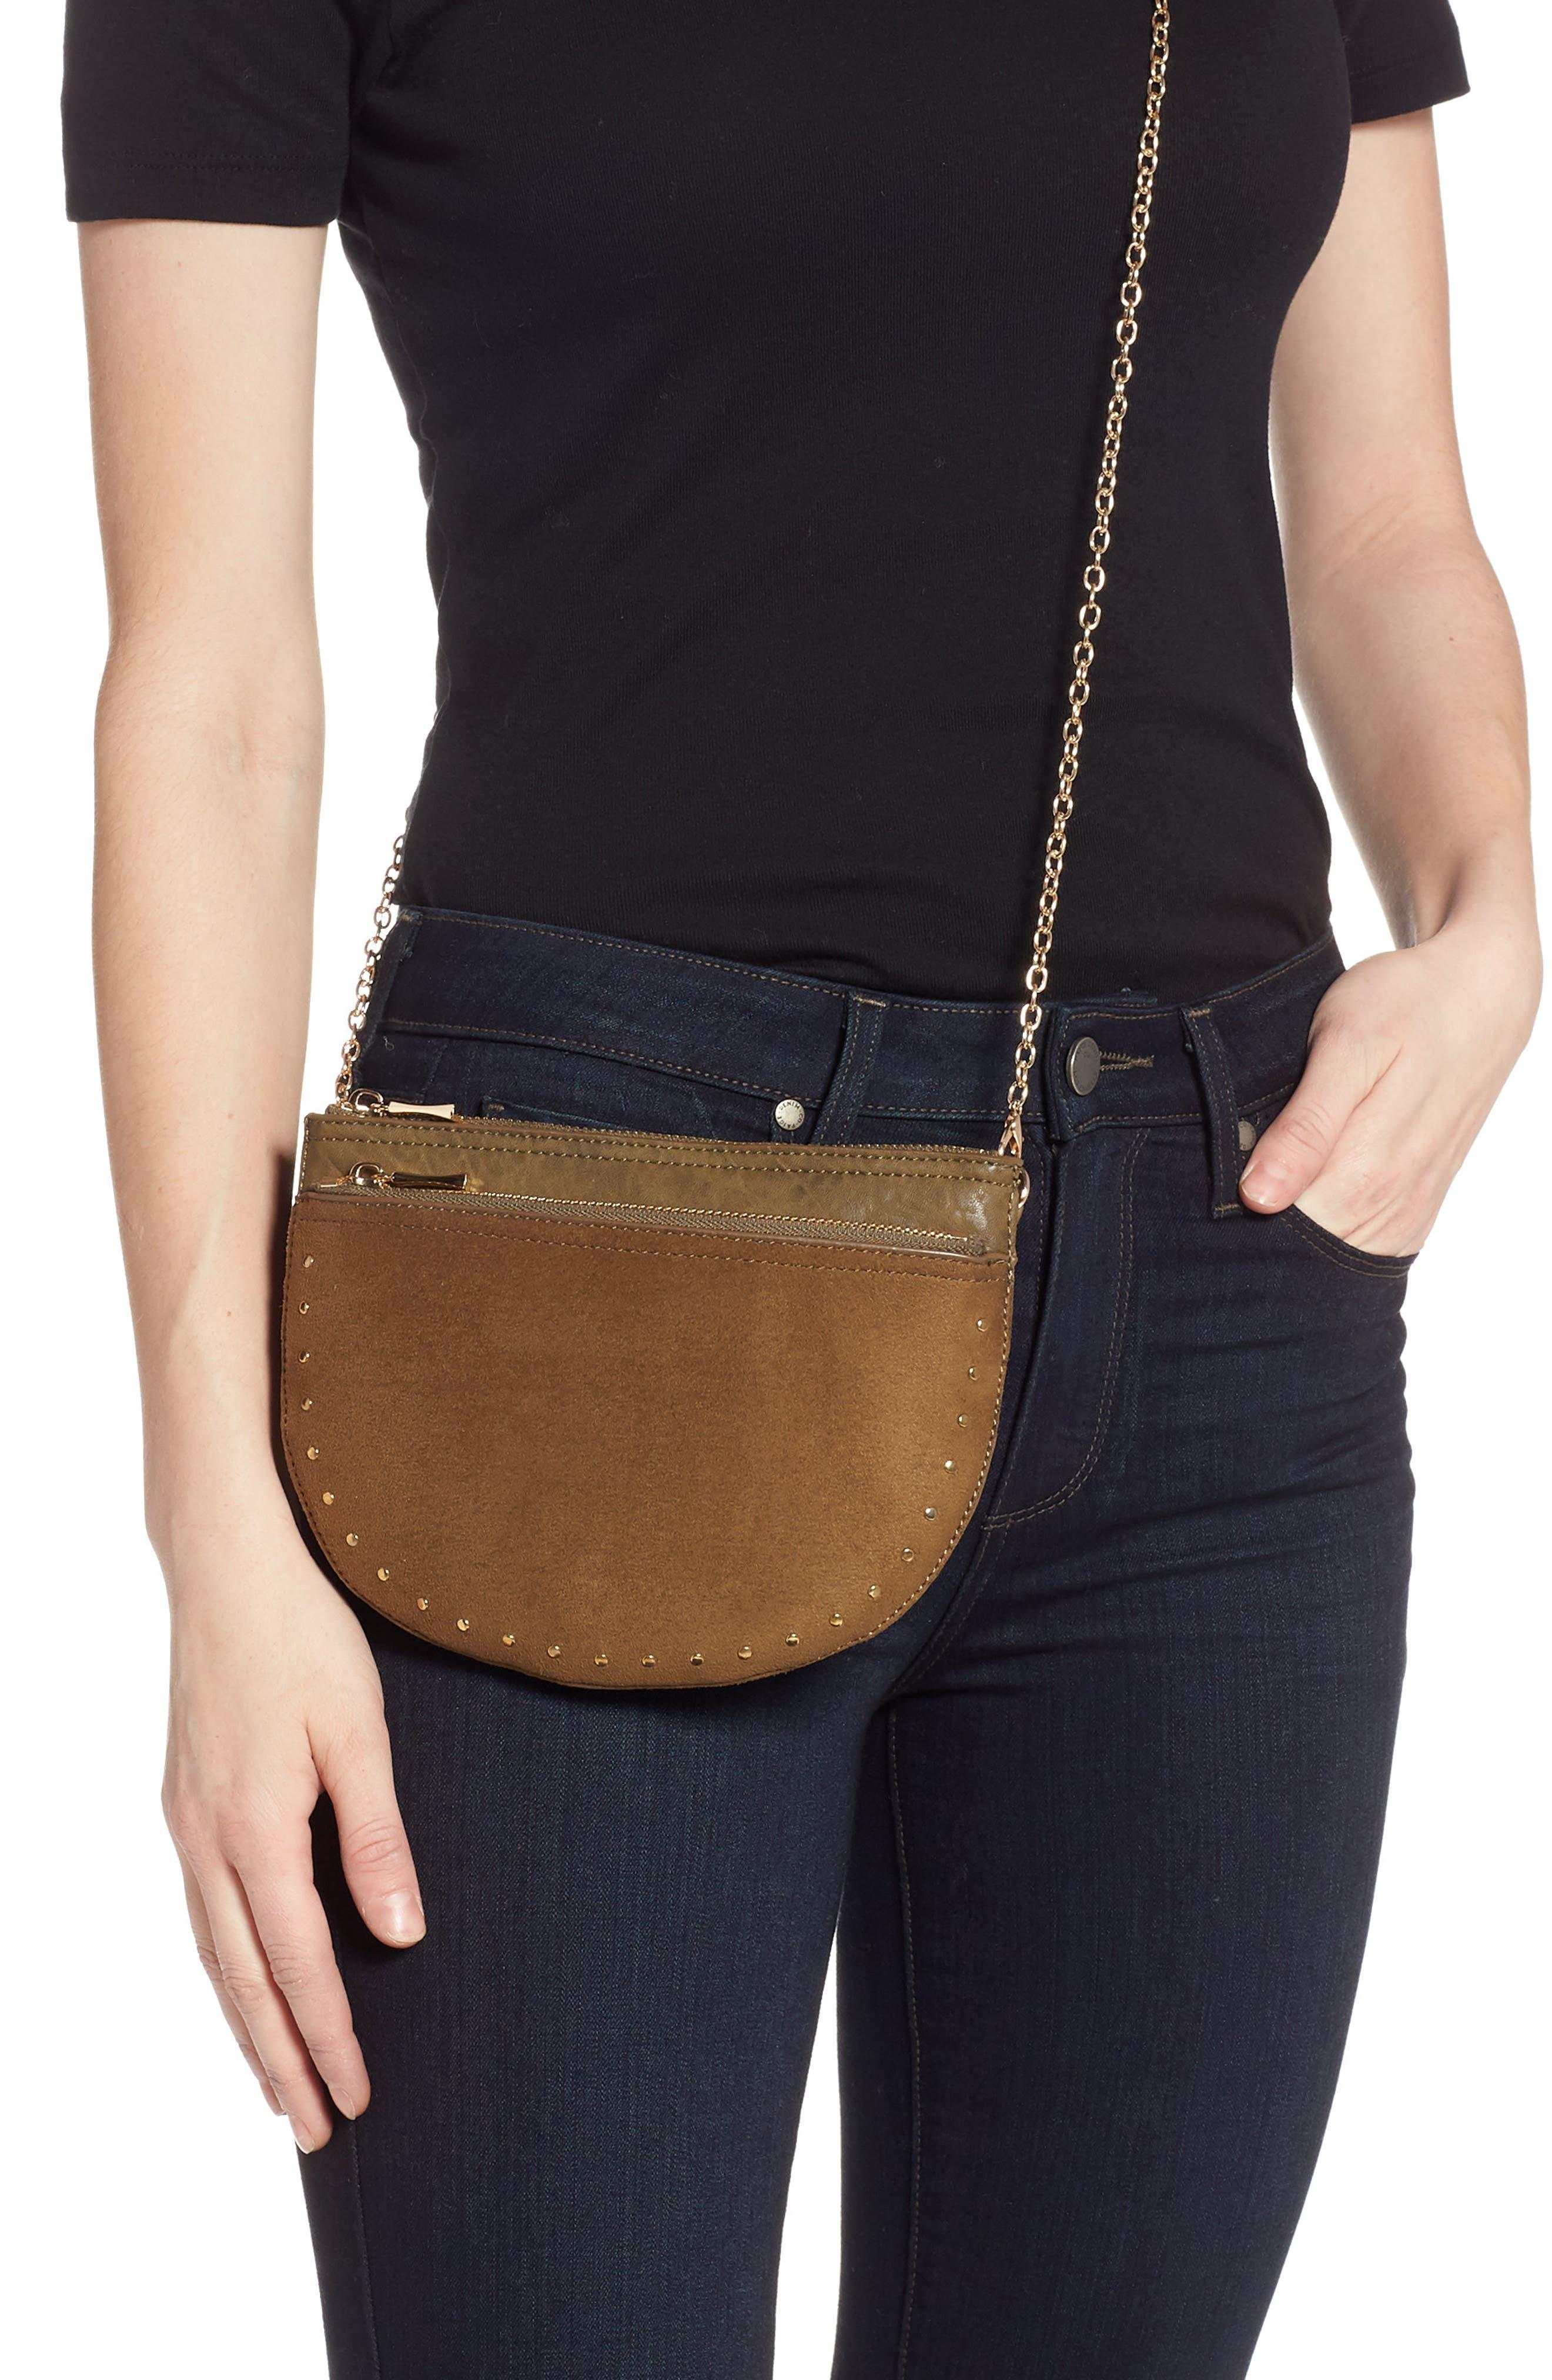 SOLE SOCIETY, Jeana Studded Convertible Belt Bag, Alternate thumbnail 4, color, OLIVE